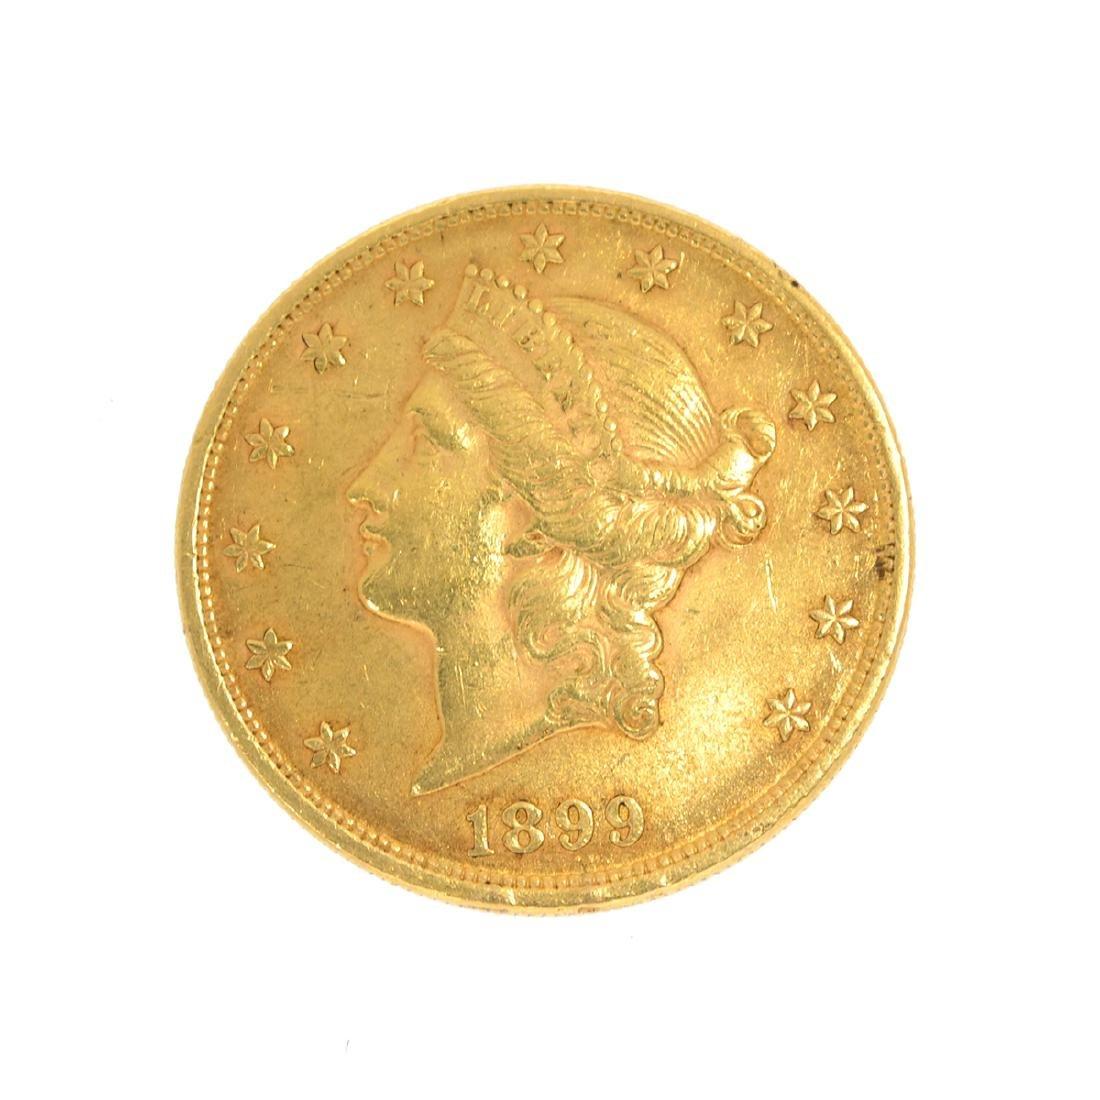 *1899 $20 U.S. Liberty Head Gold Coin (DF)